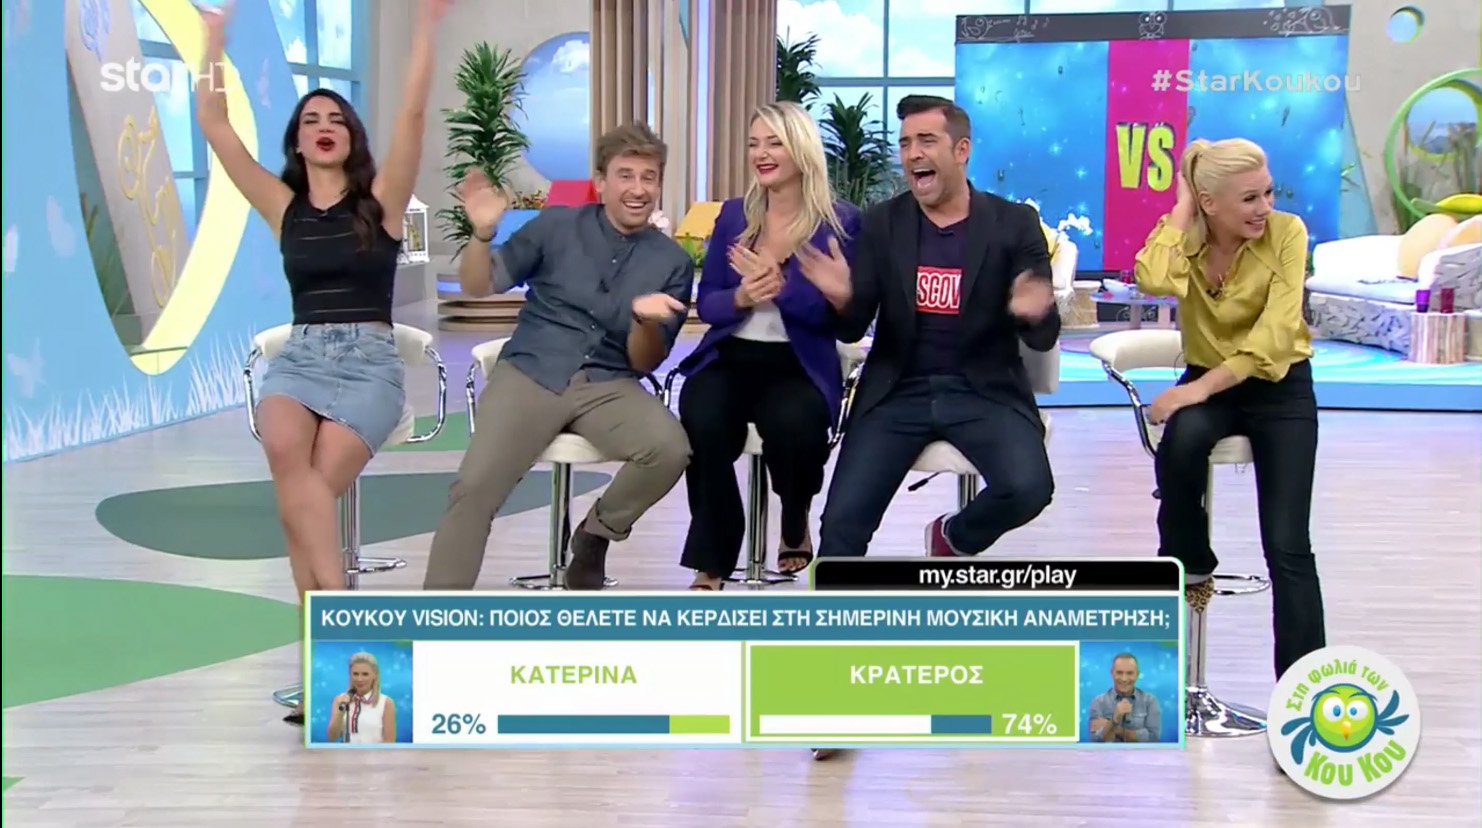 Megaphone TV Makes Greek Debut on Star Channel's KouKou